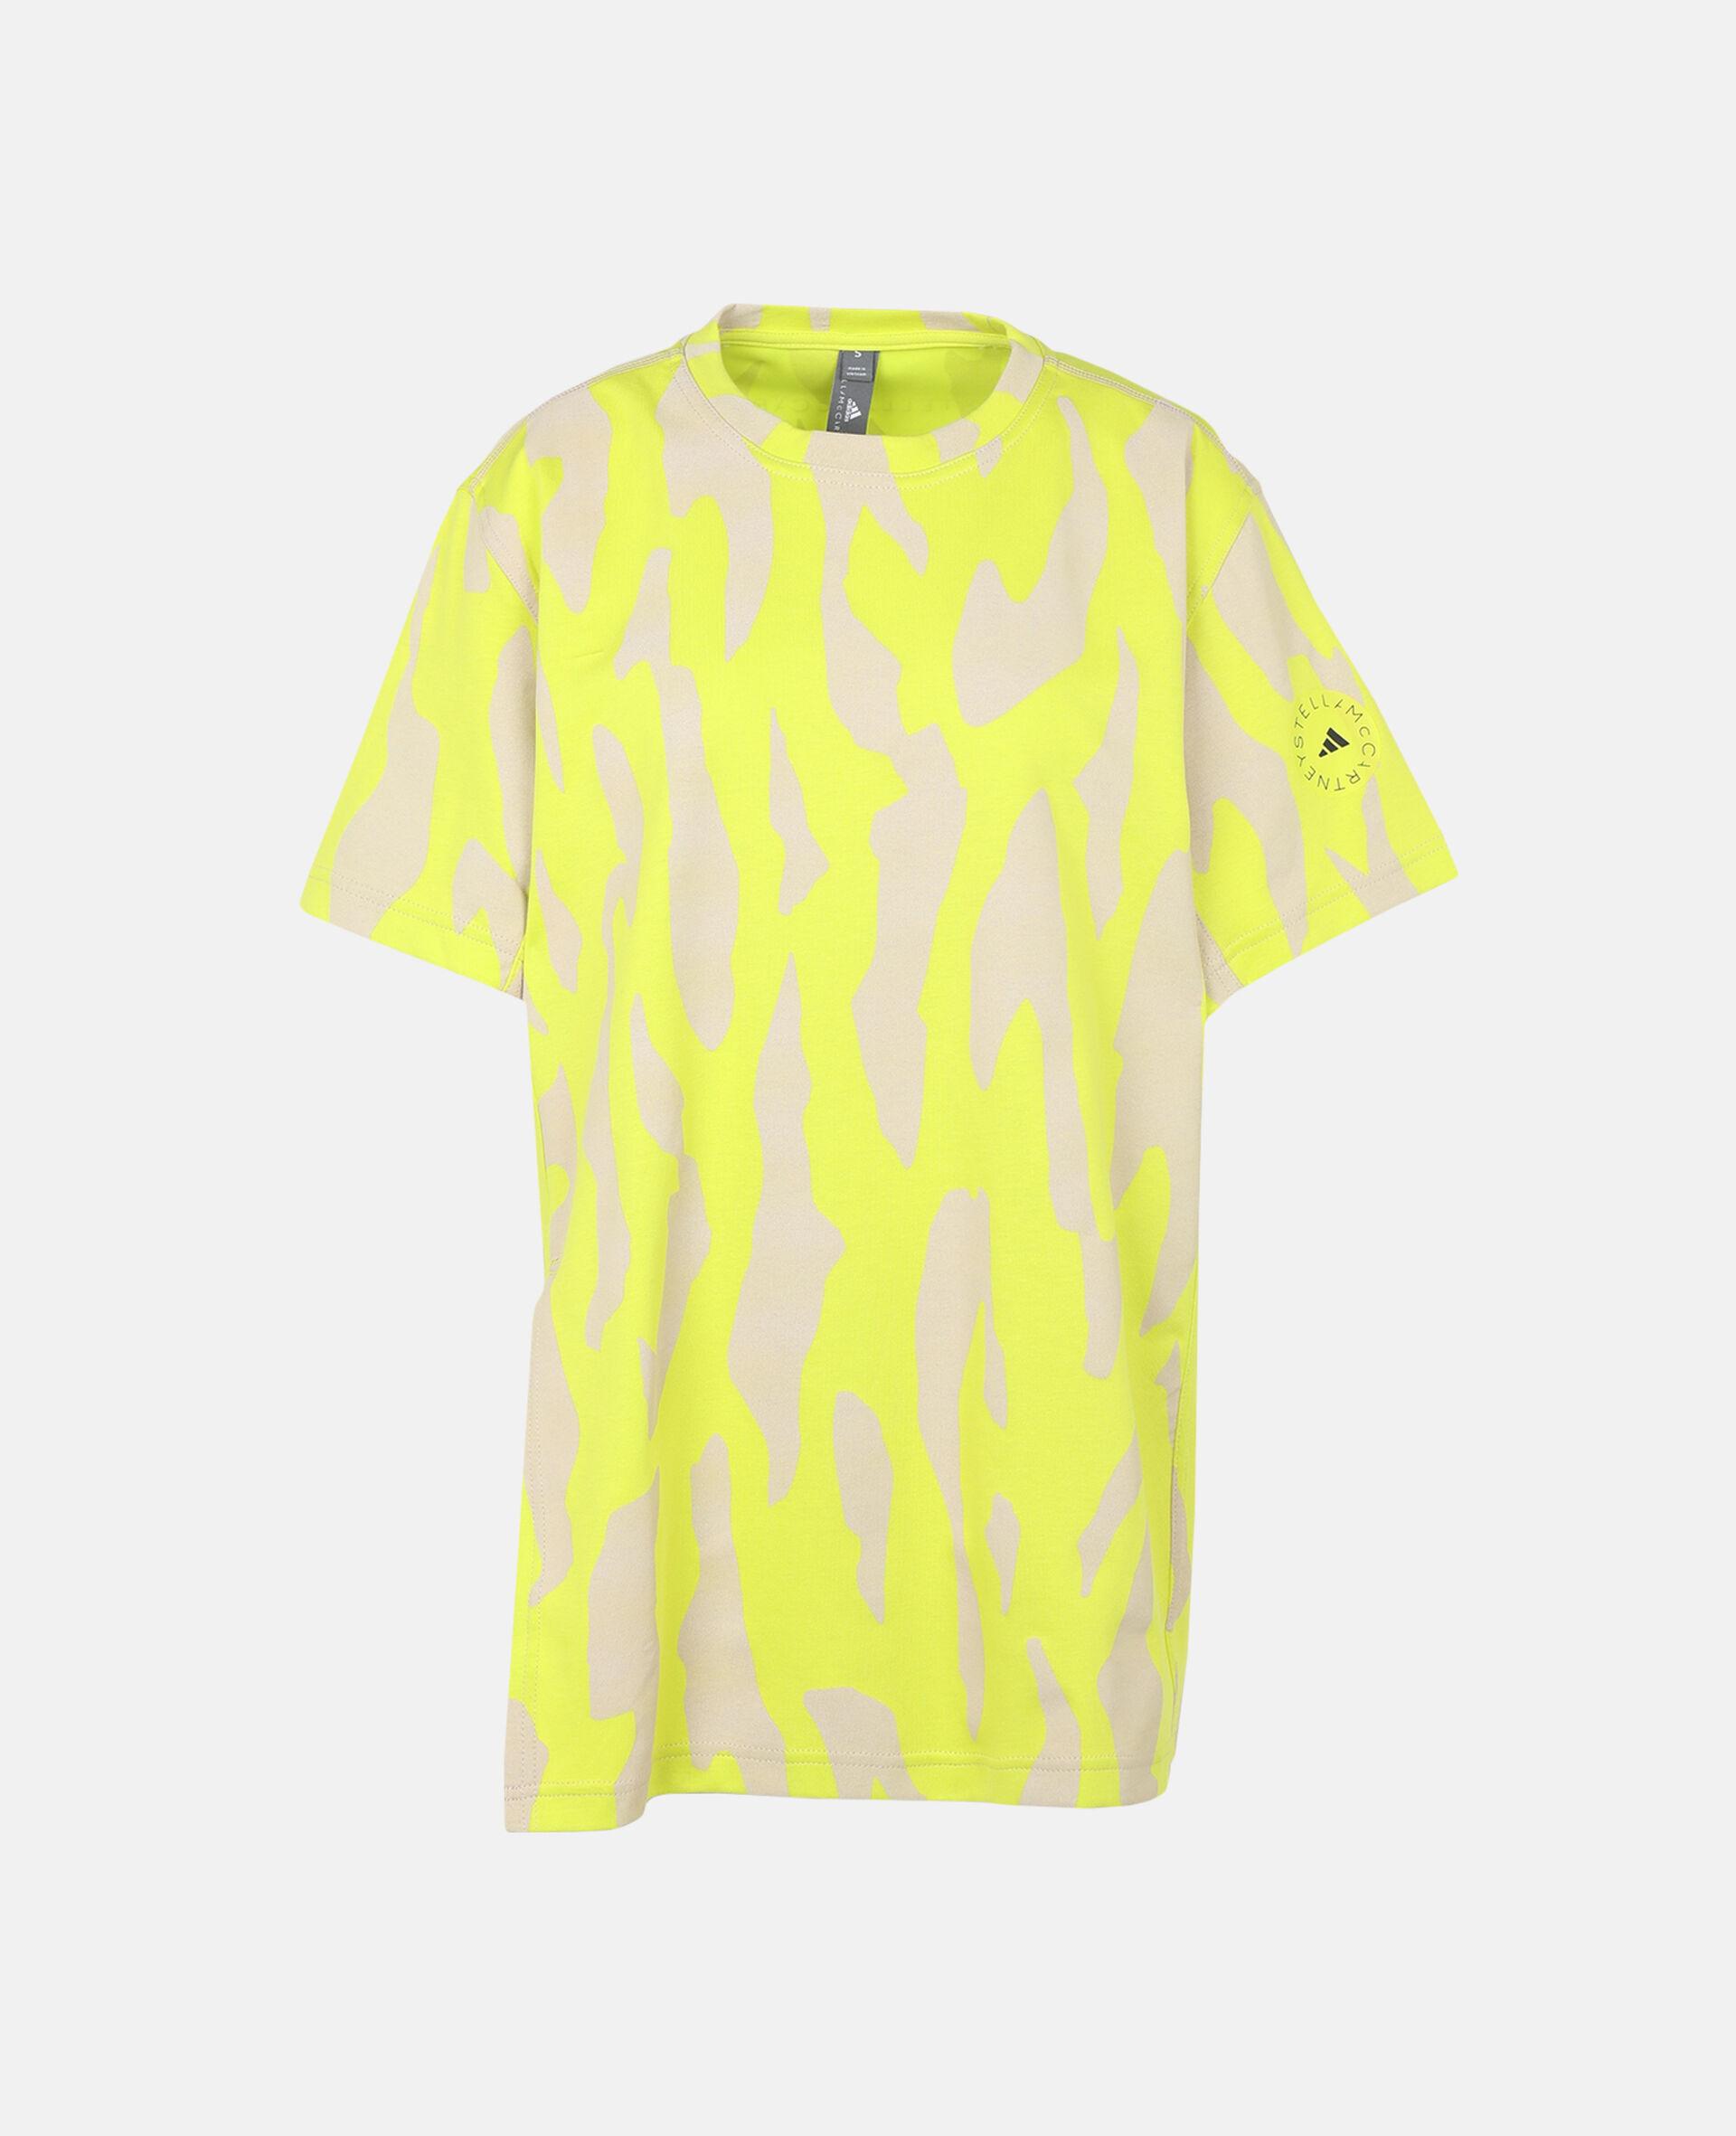 Future Playground T-Shirt-Yellow-large image number 0